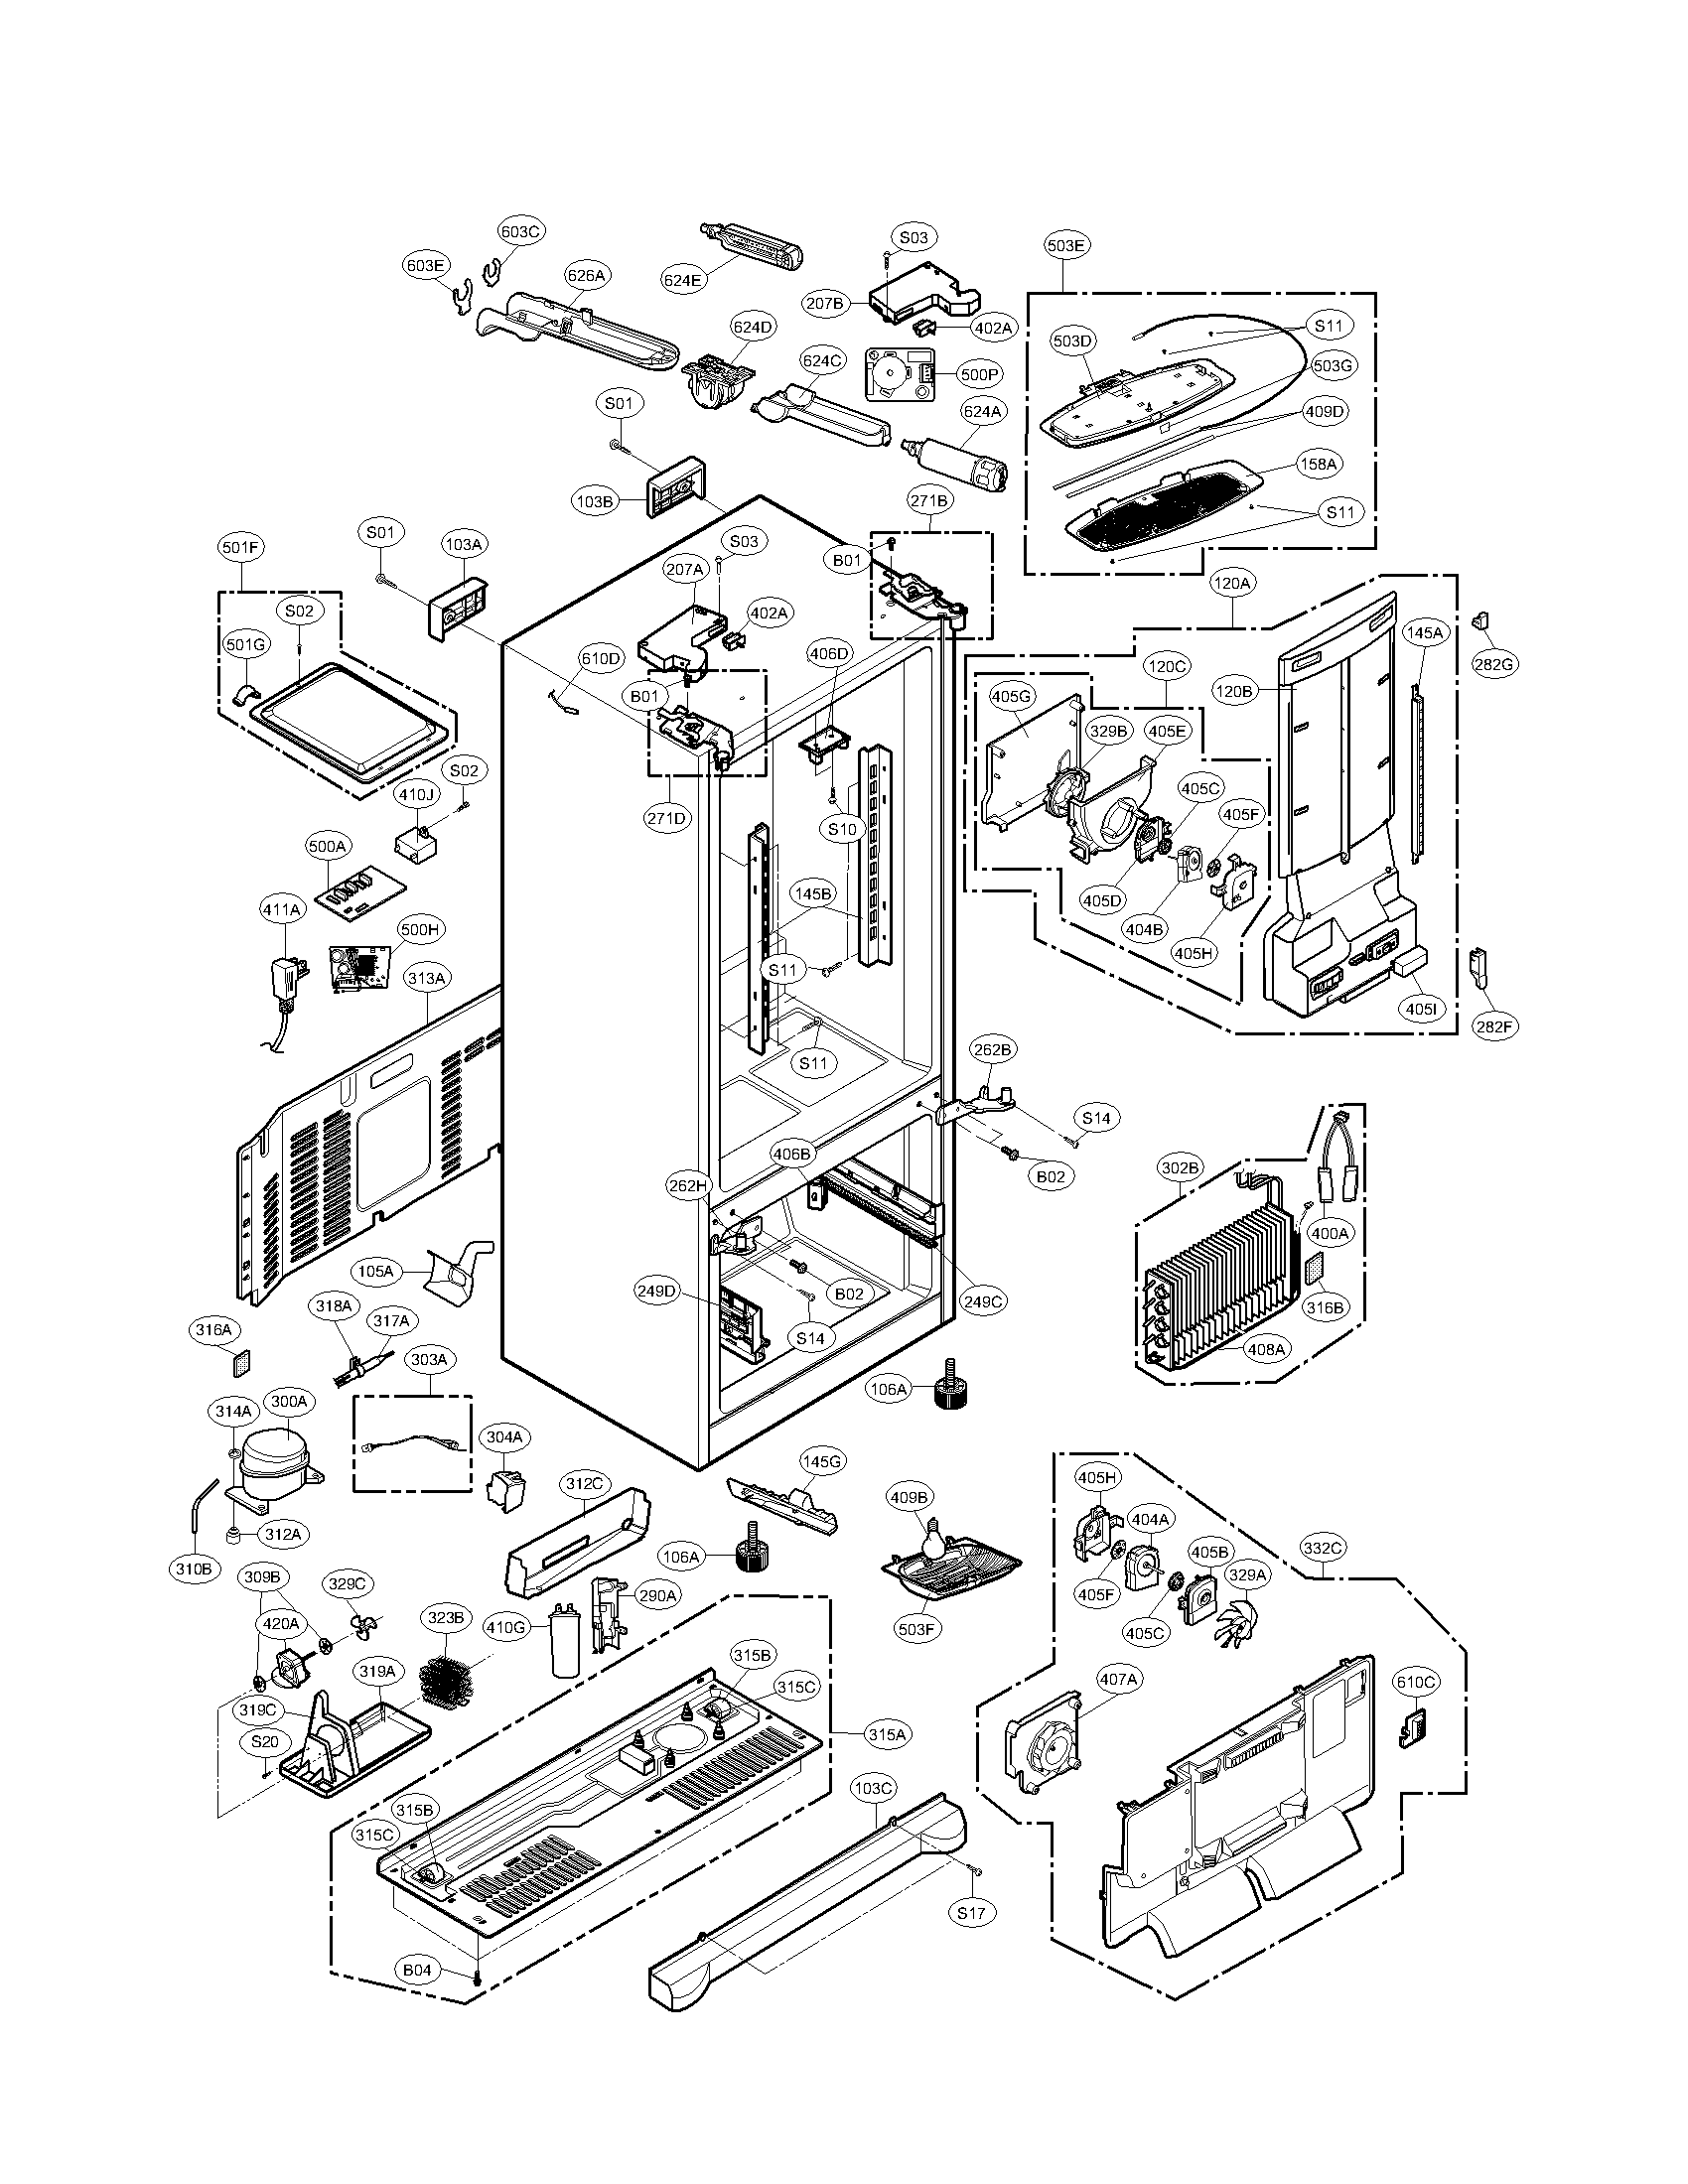 kenmore 106 refrigerator parts diagram 1992 mazda b2200 alternator wiring elite model 79571053010 bottom mount genuine